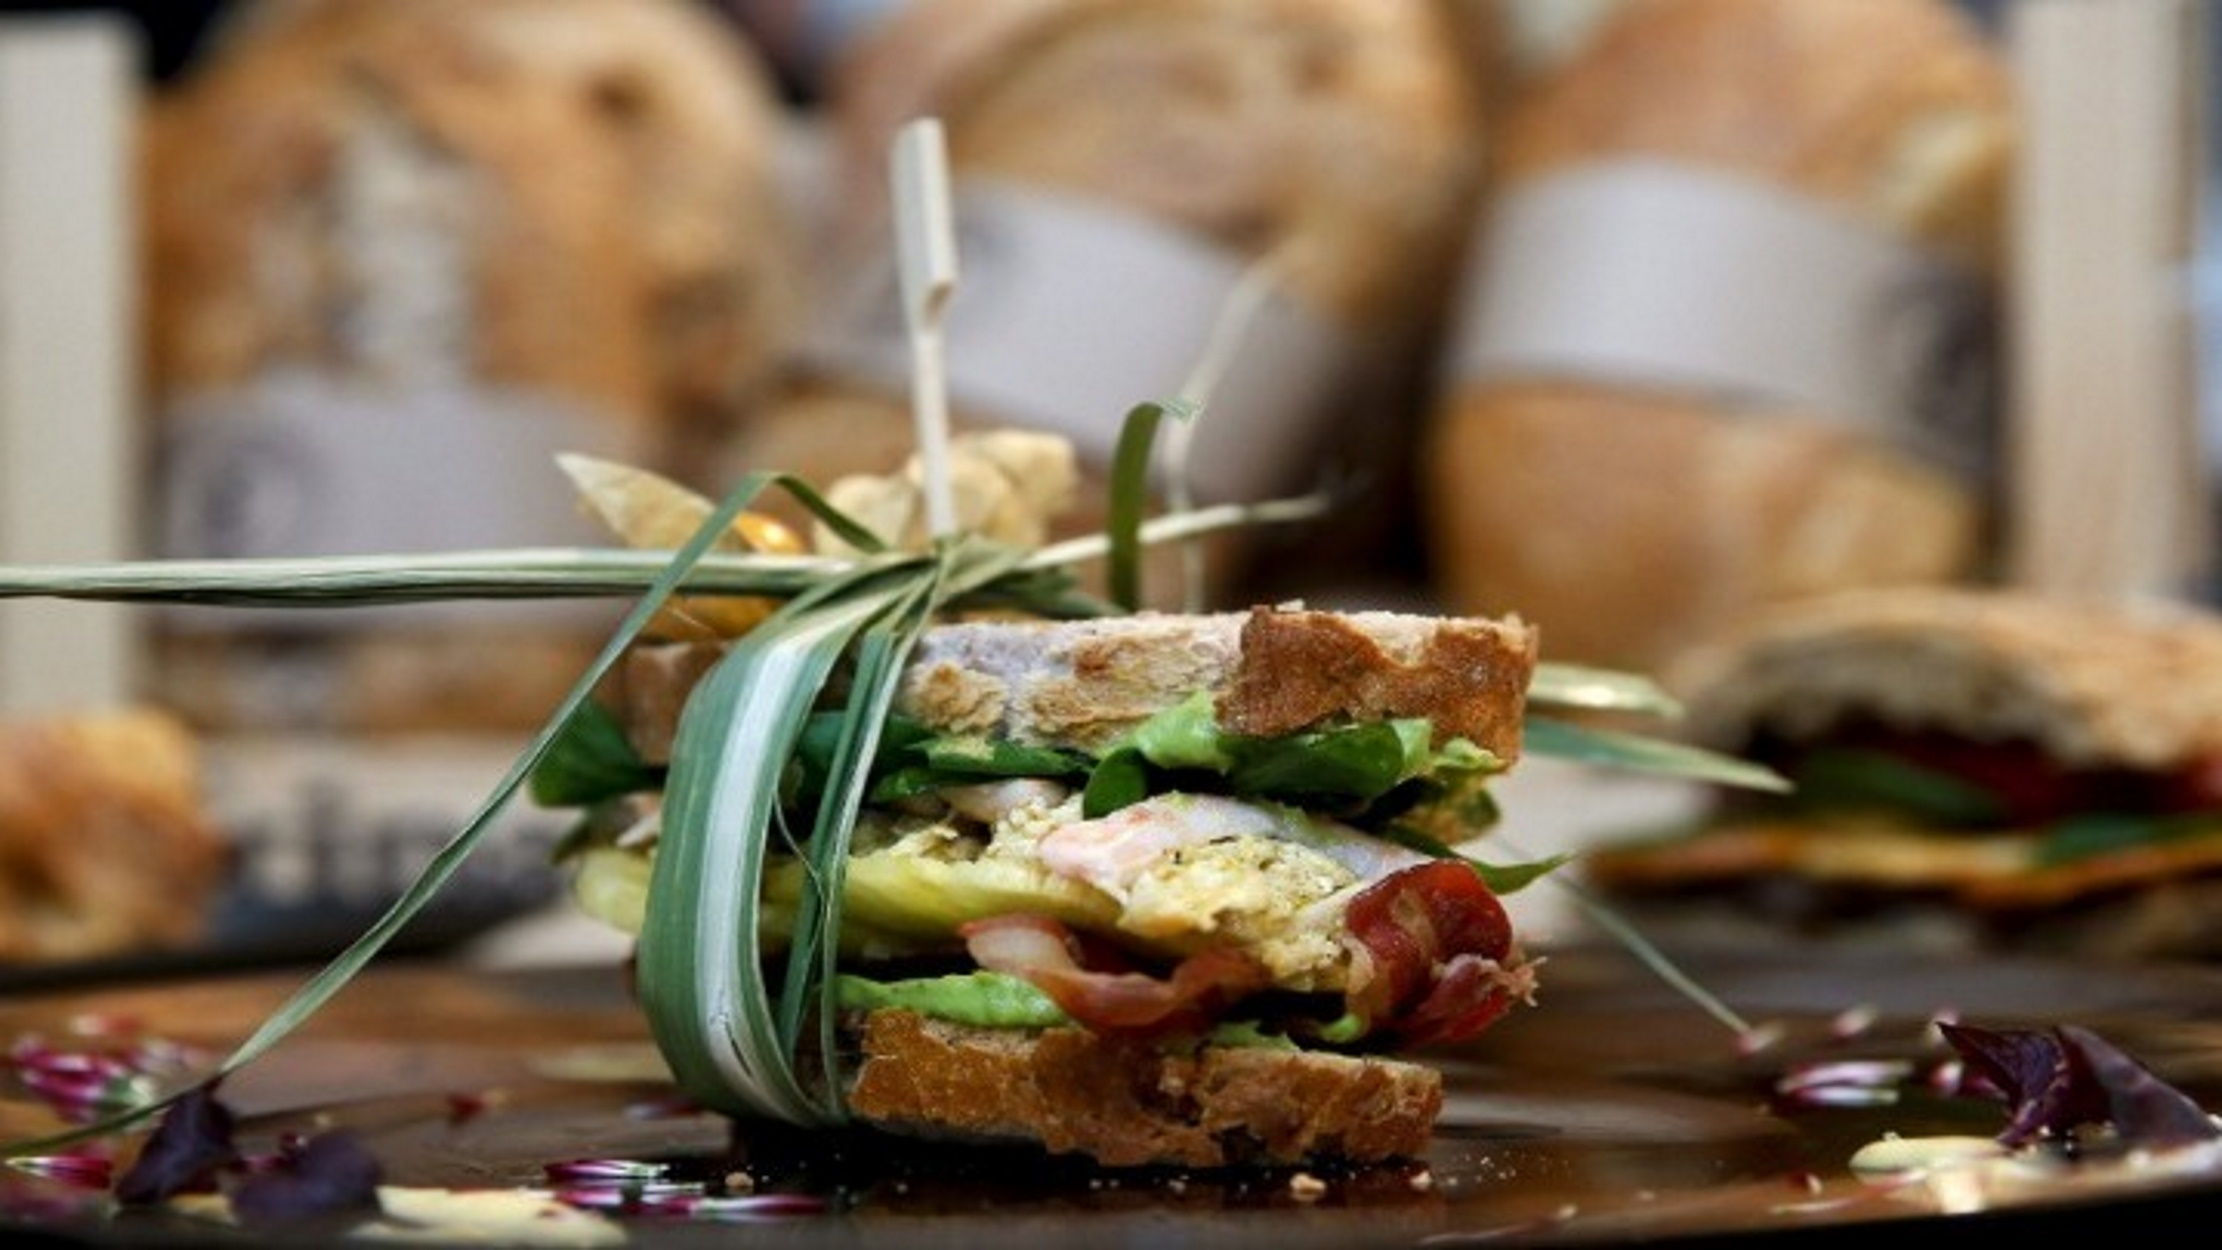 Masterchef για Όσκαρ: Εστιατόριο με 3 αστέρια Michelin κουζίνα απόρων